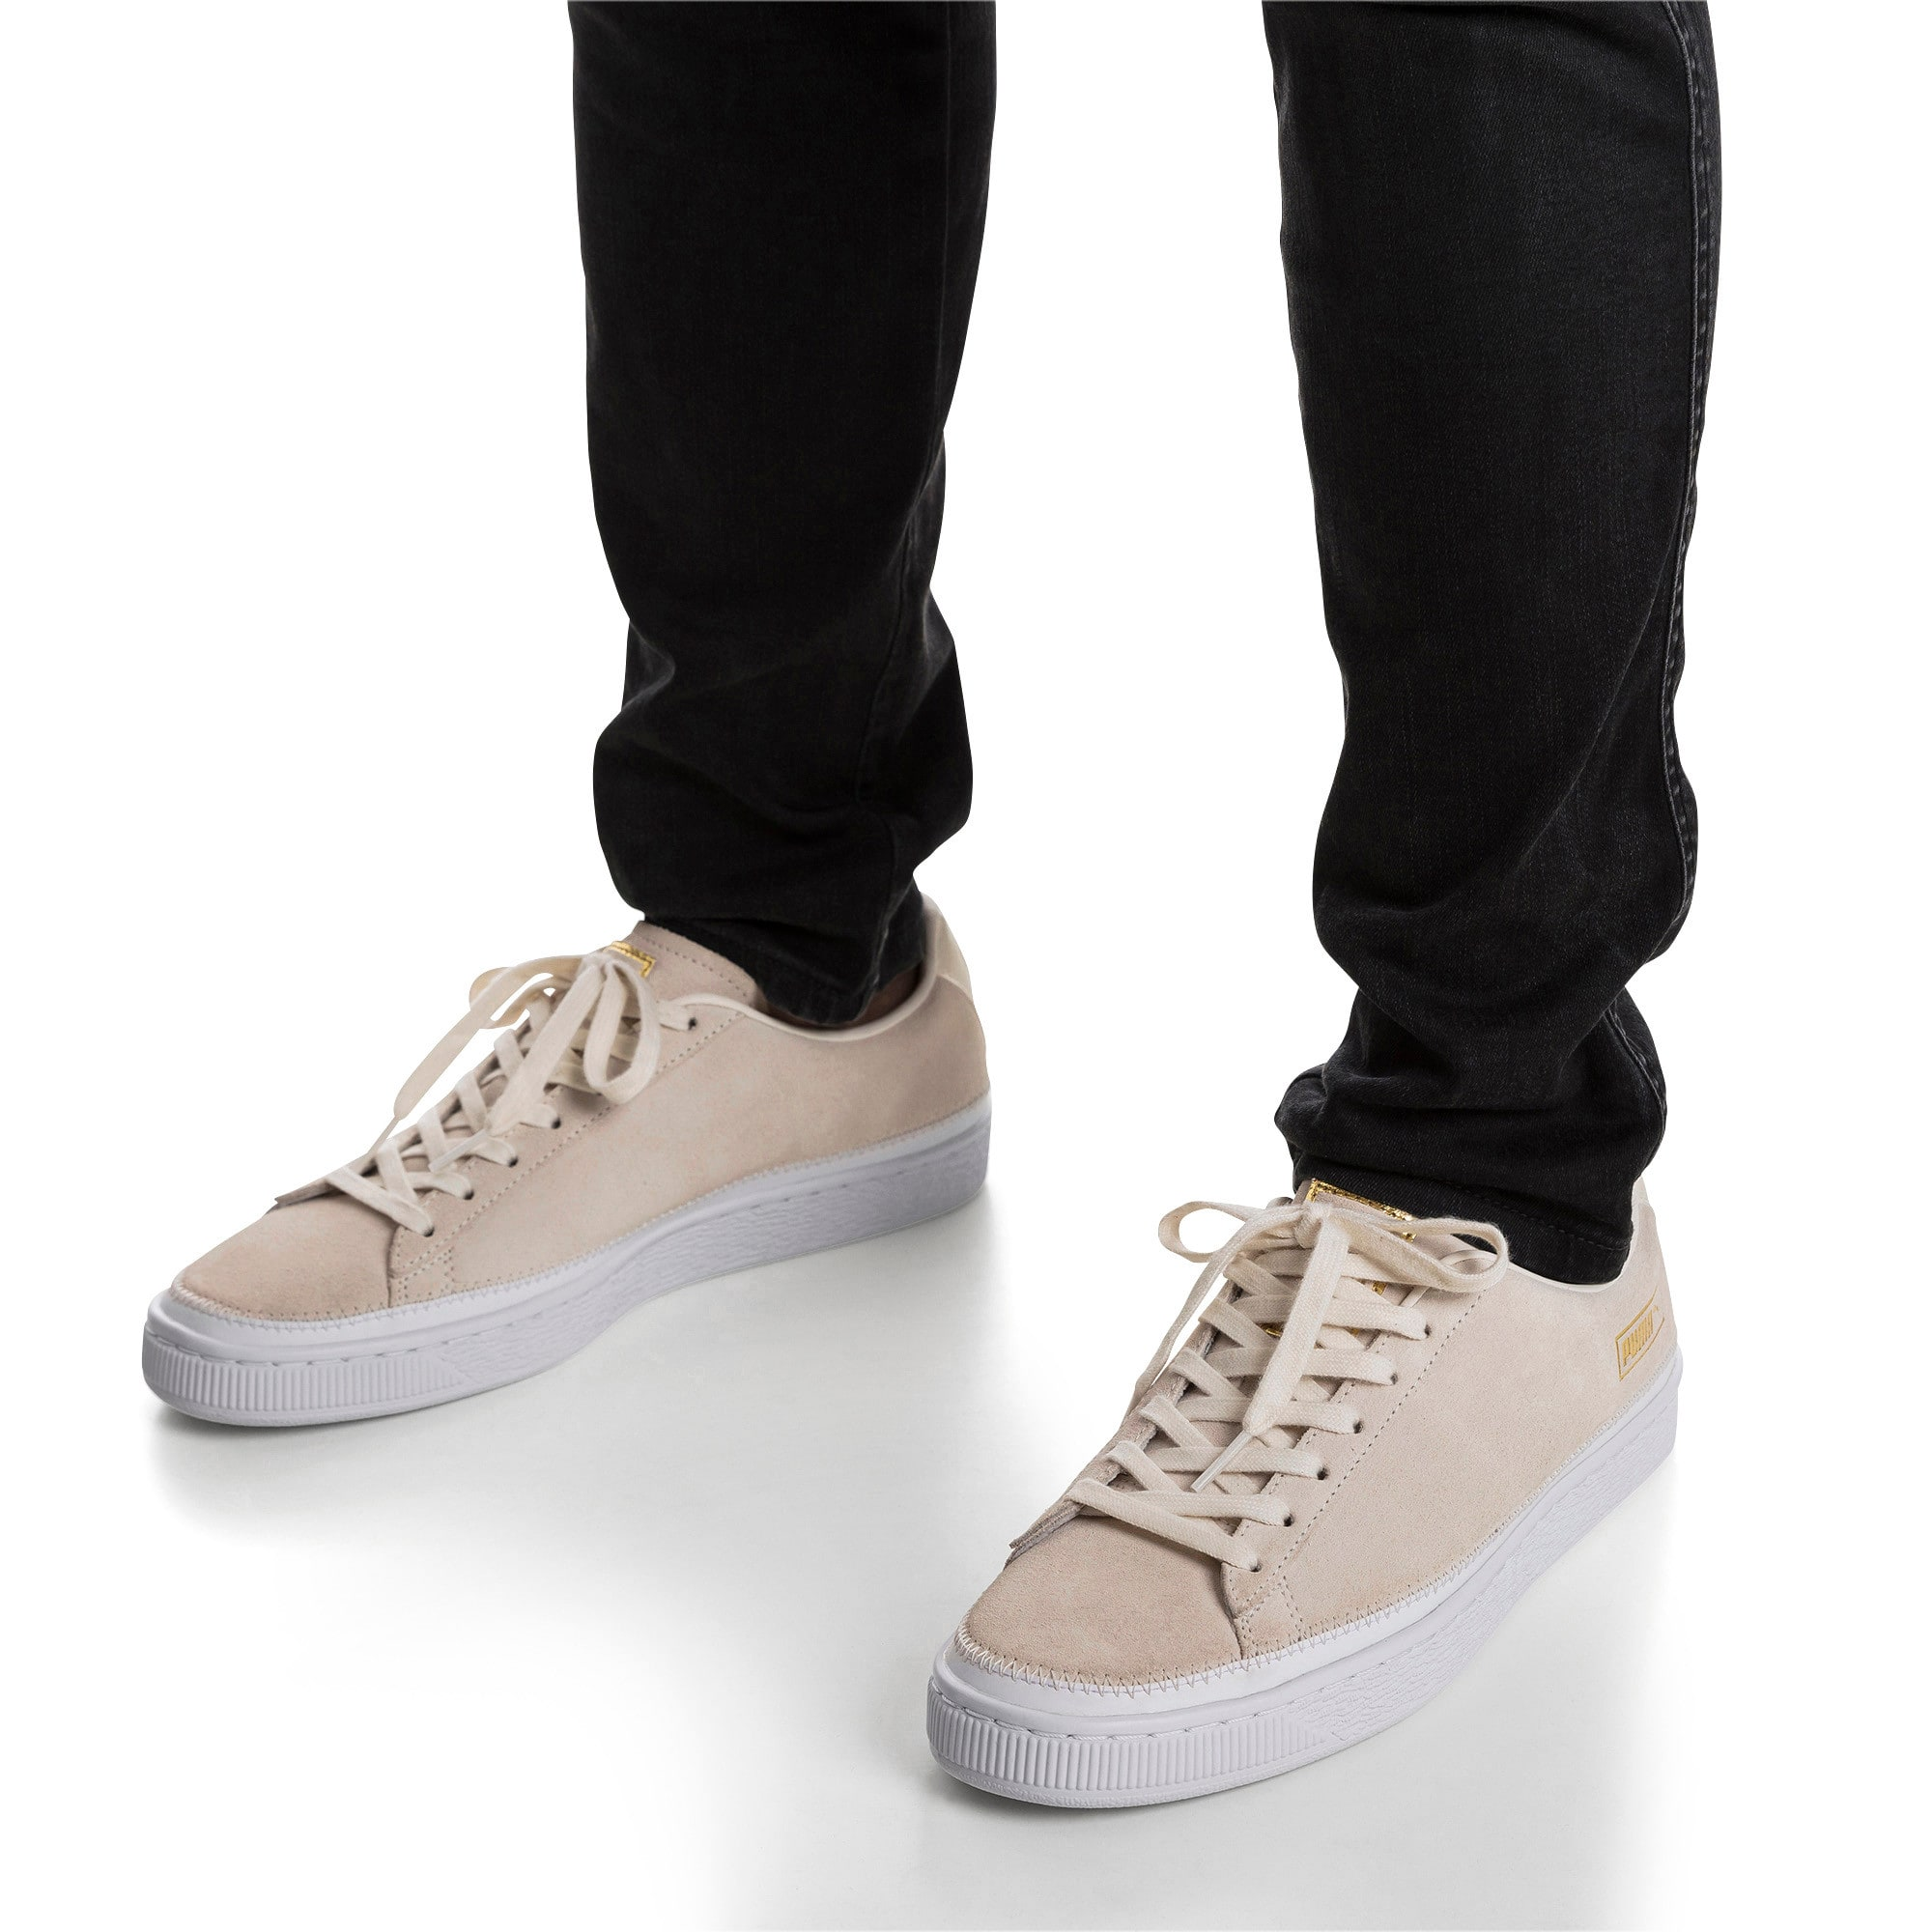 Thumbnail 2 of Suede Trim Sneaker, Whisper White-White- Gold, medium